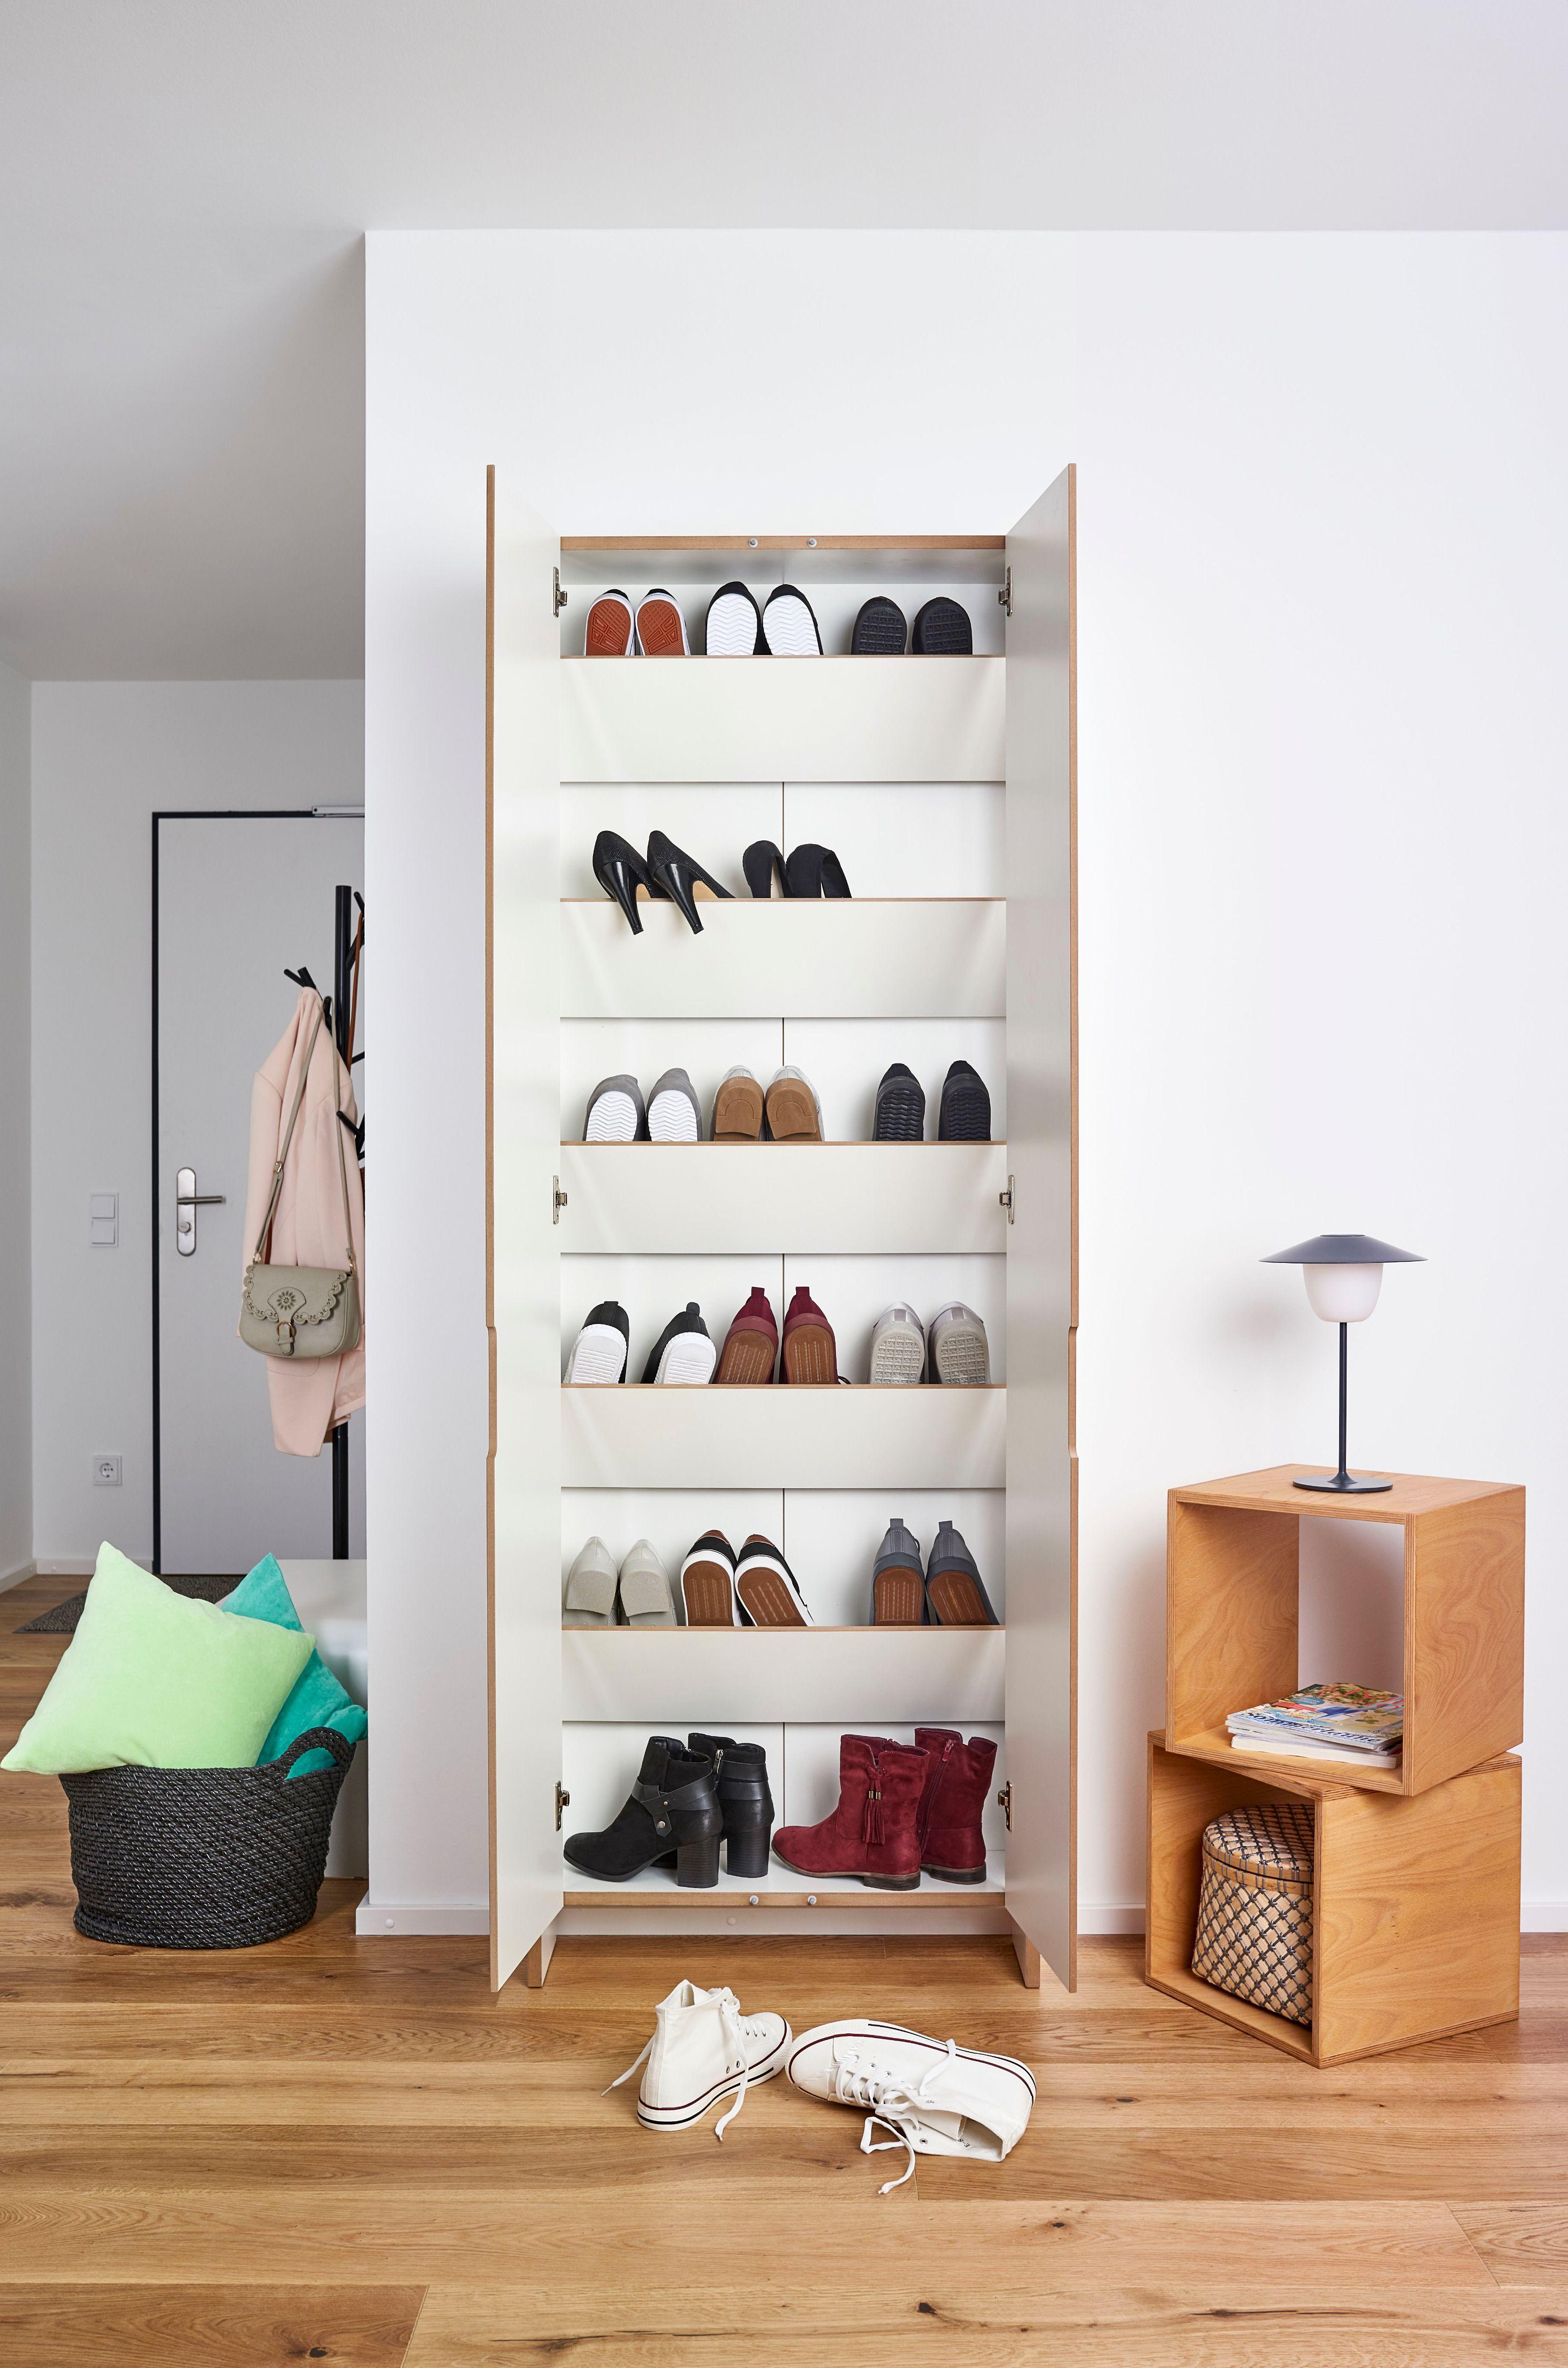 Flachmann Closet Hausmobel Schuhschrank Schrank